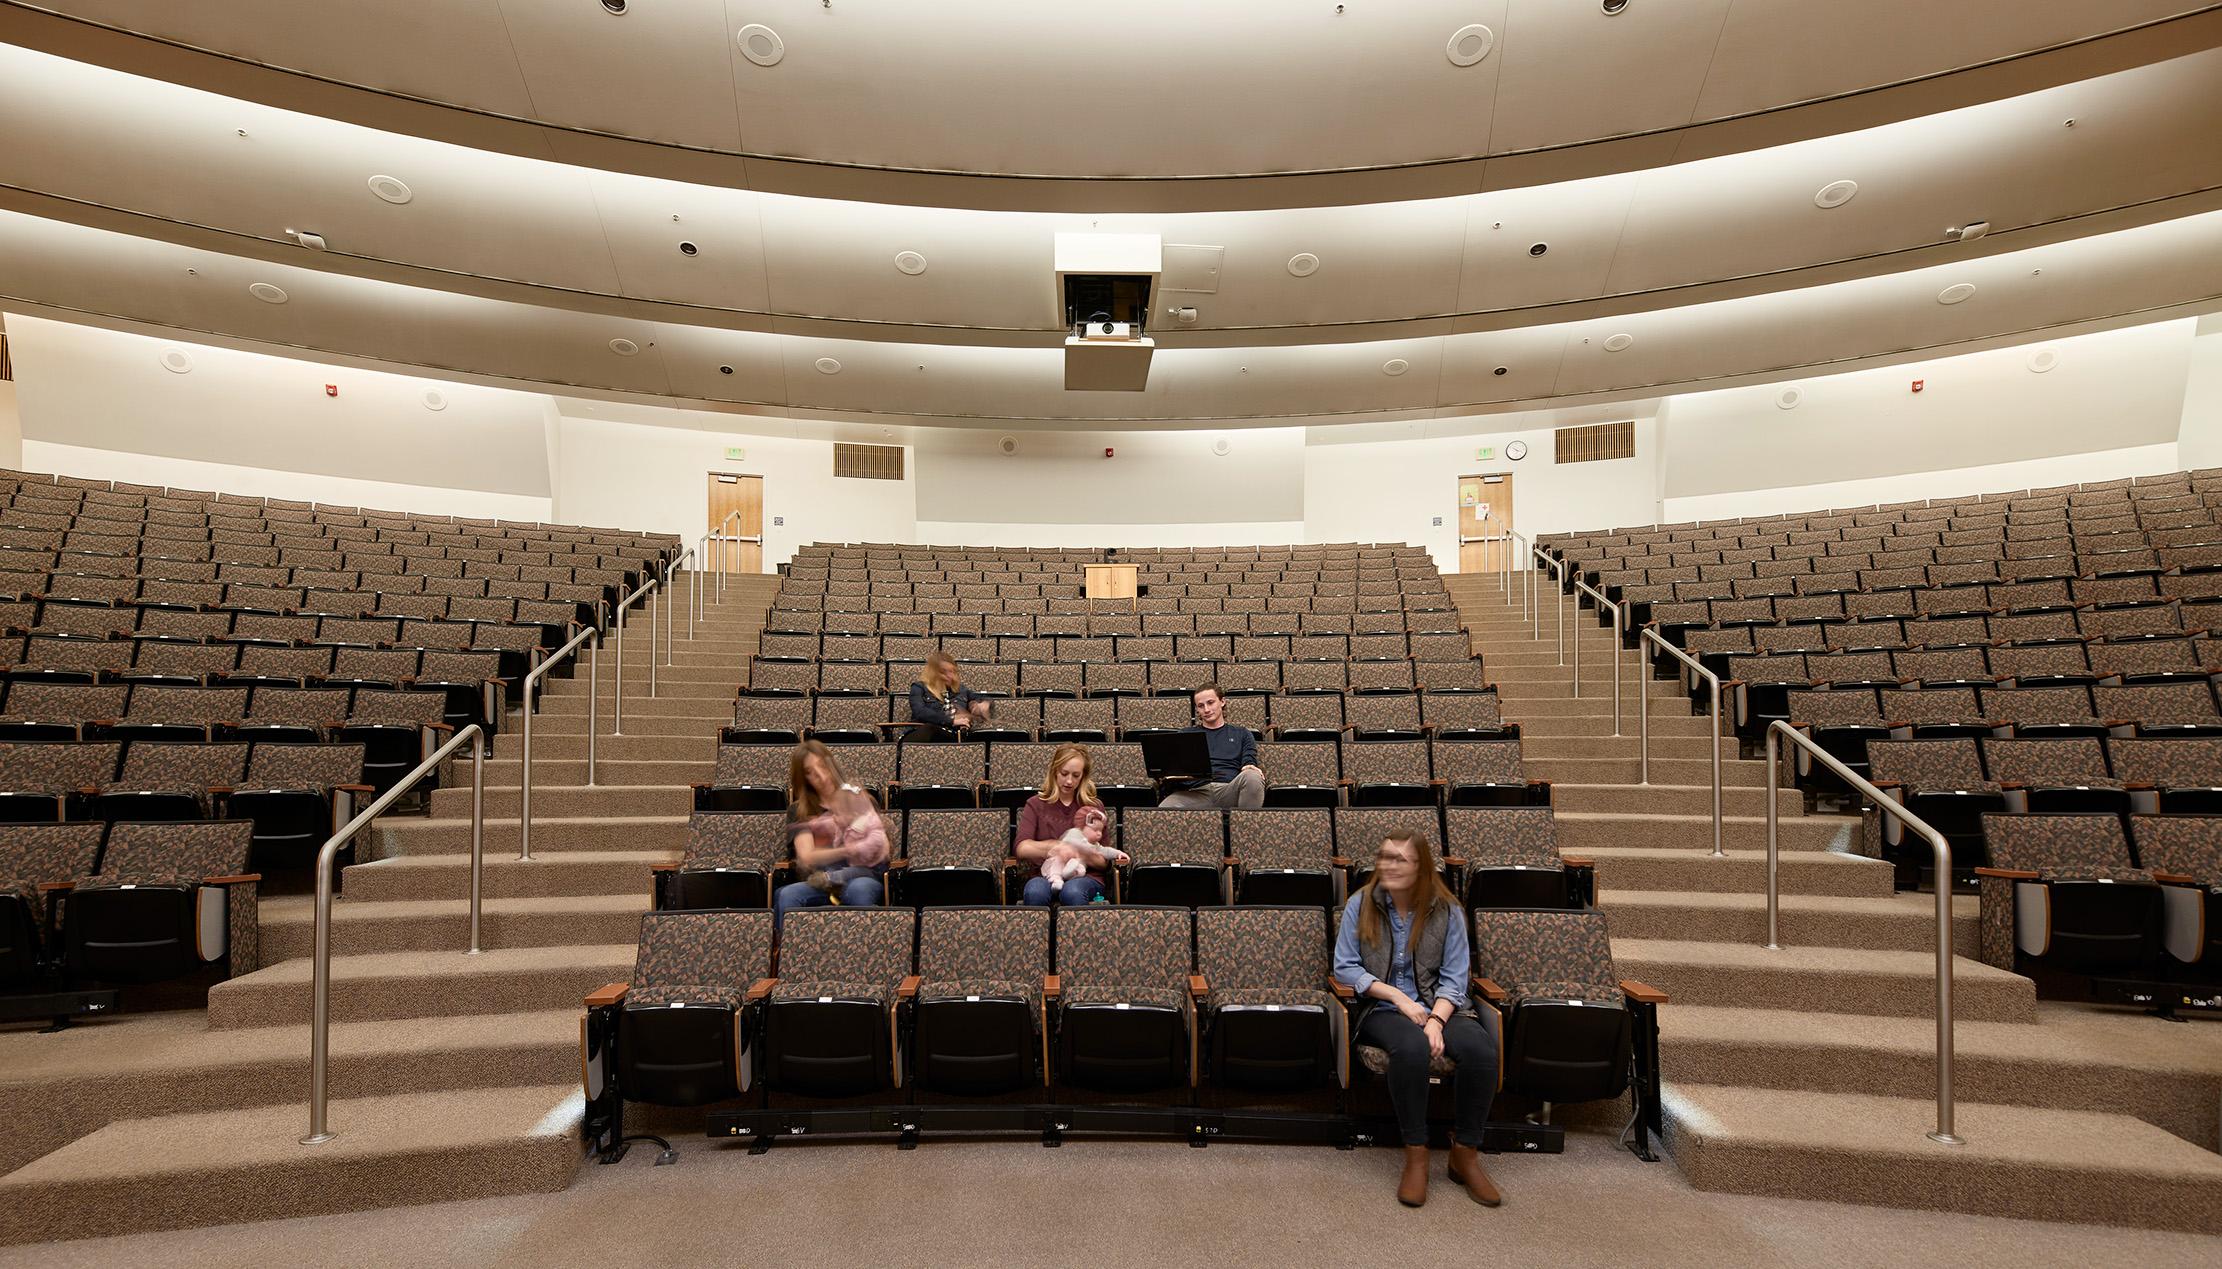 Widtsoe Hall Chemistry Building - Utah State University - Logan, UT